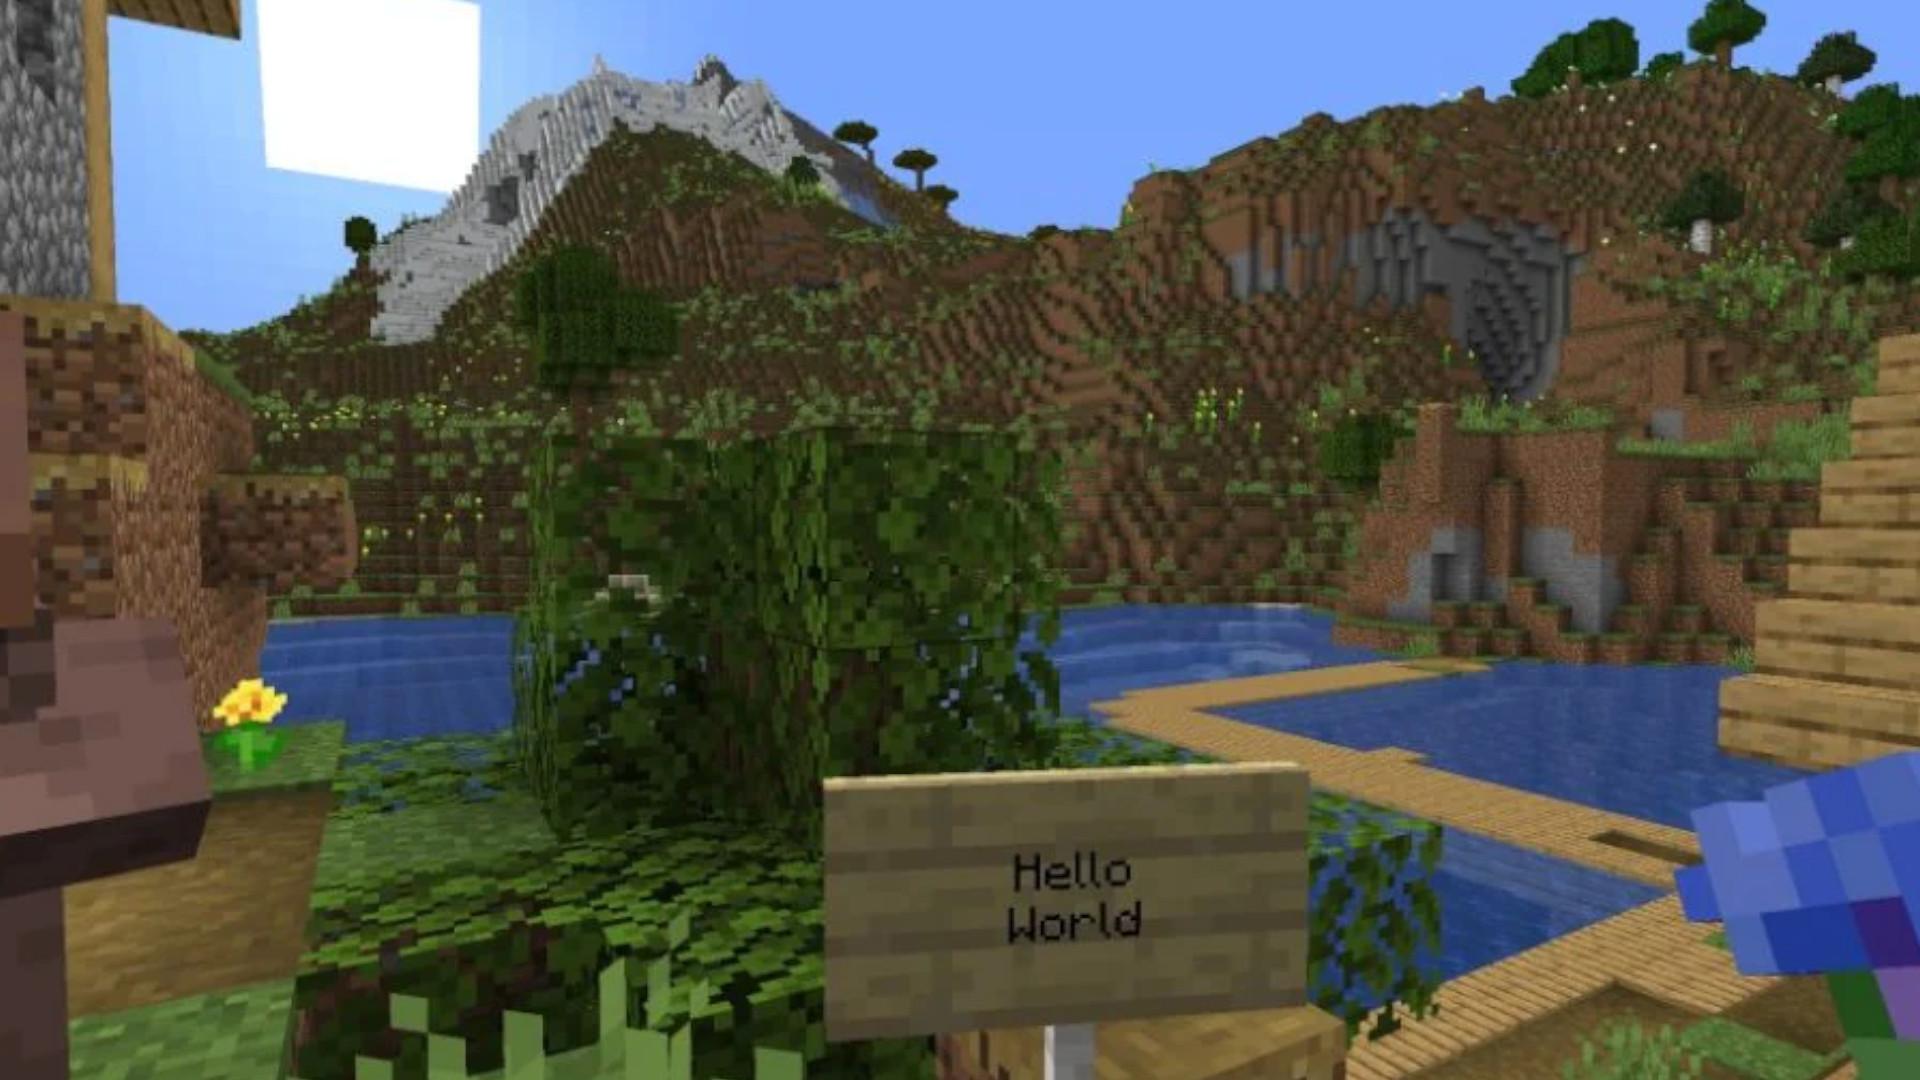 Minecraft 1.18's first proper snapshot is here